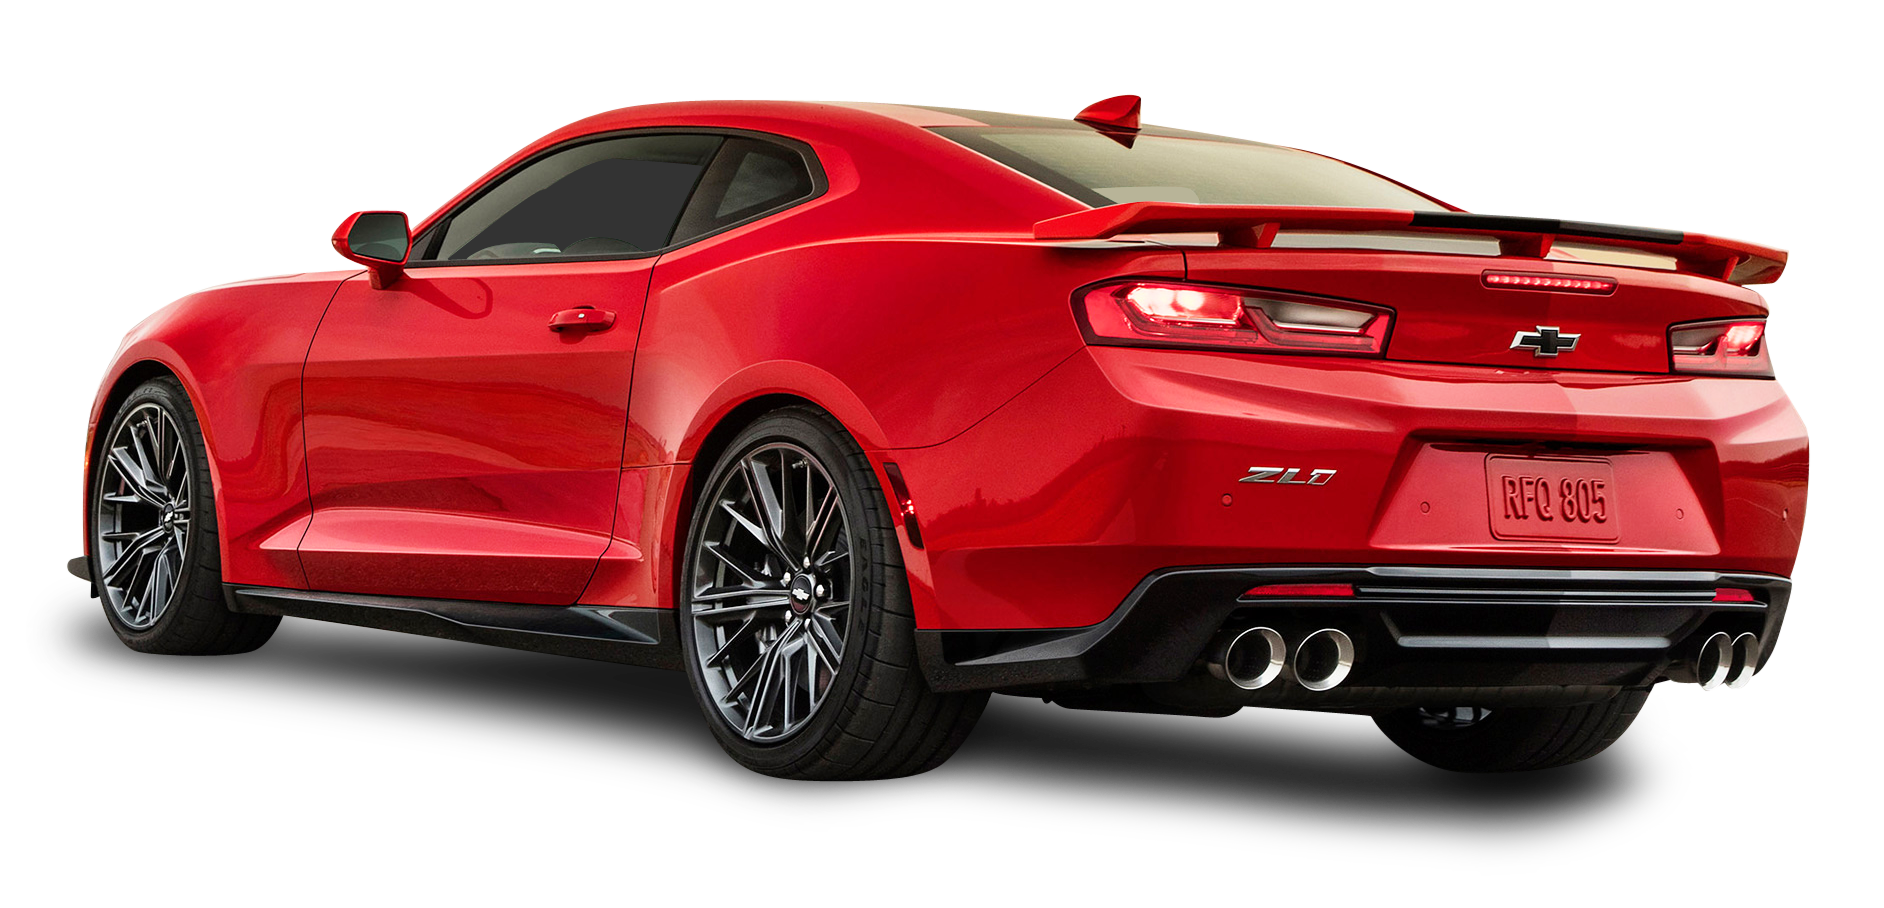 Red Chevrolet Camaro ZL1 Back Side Car